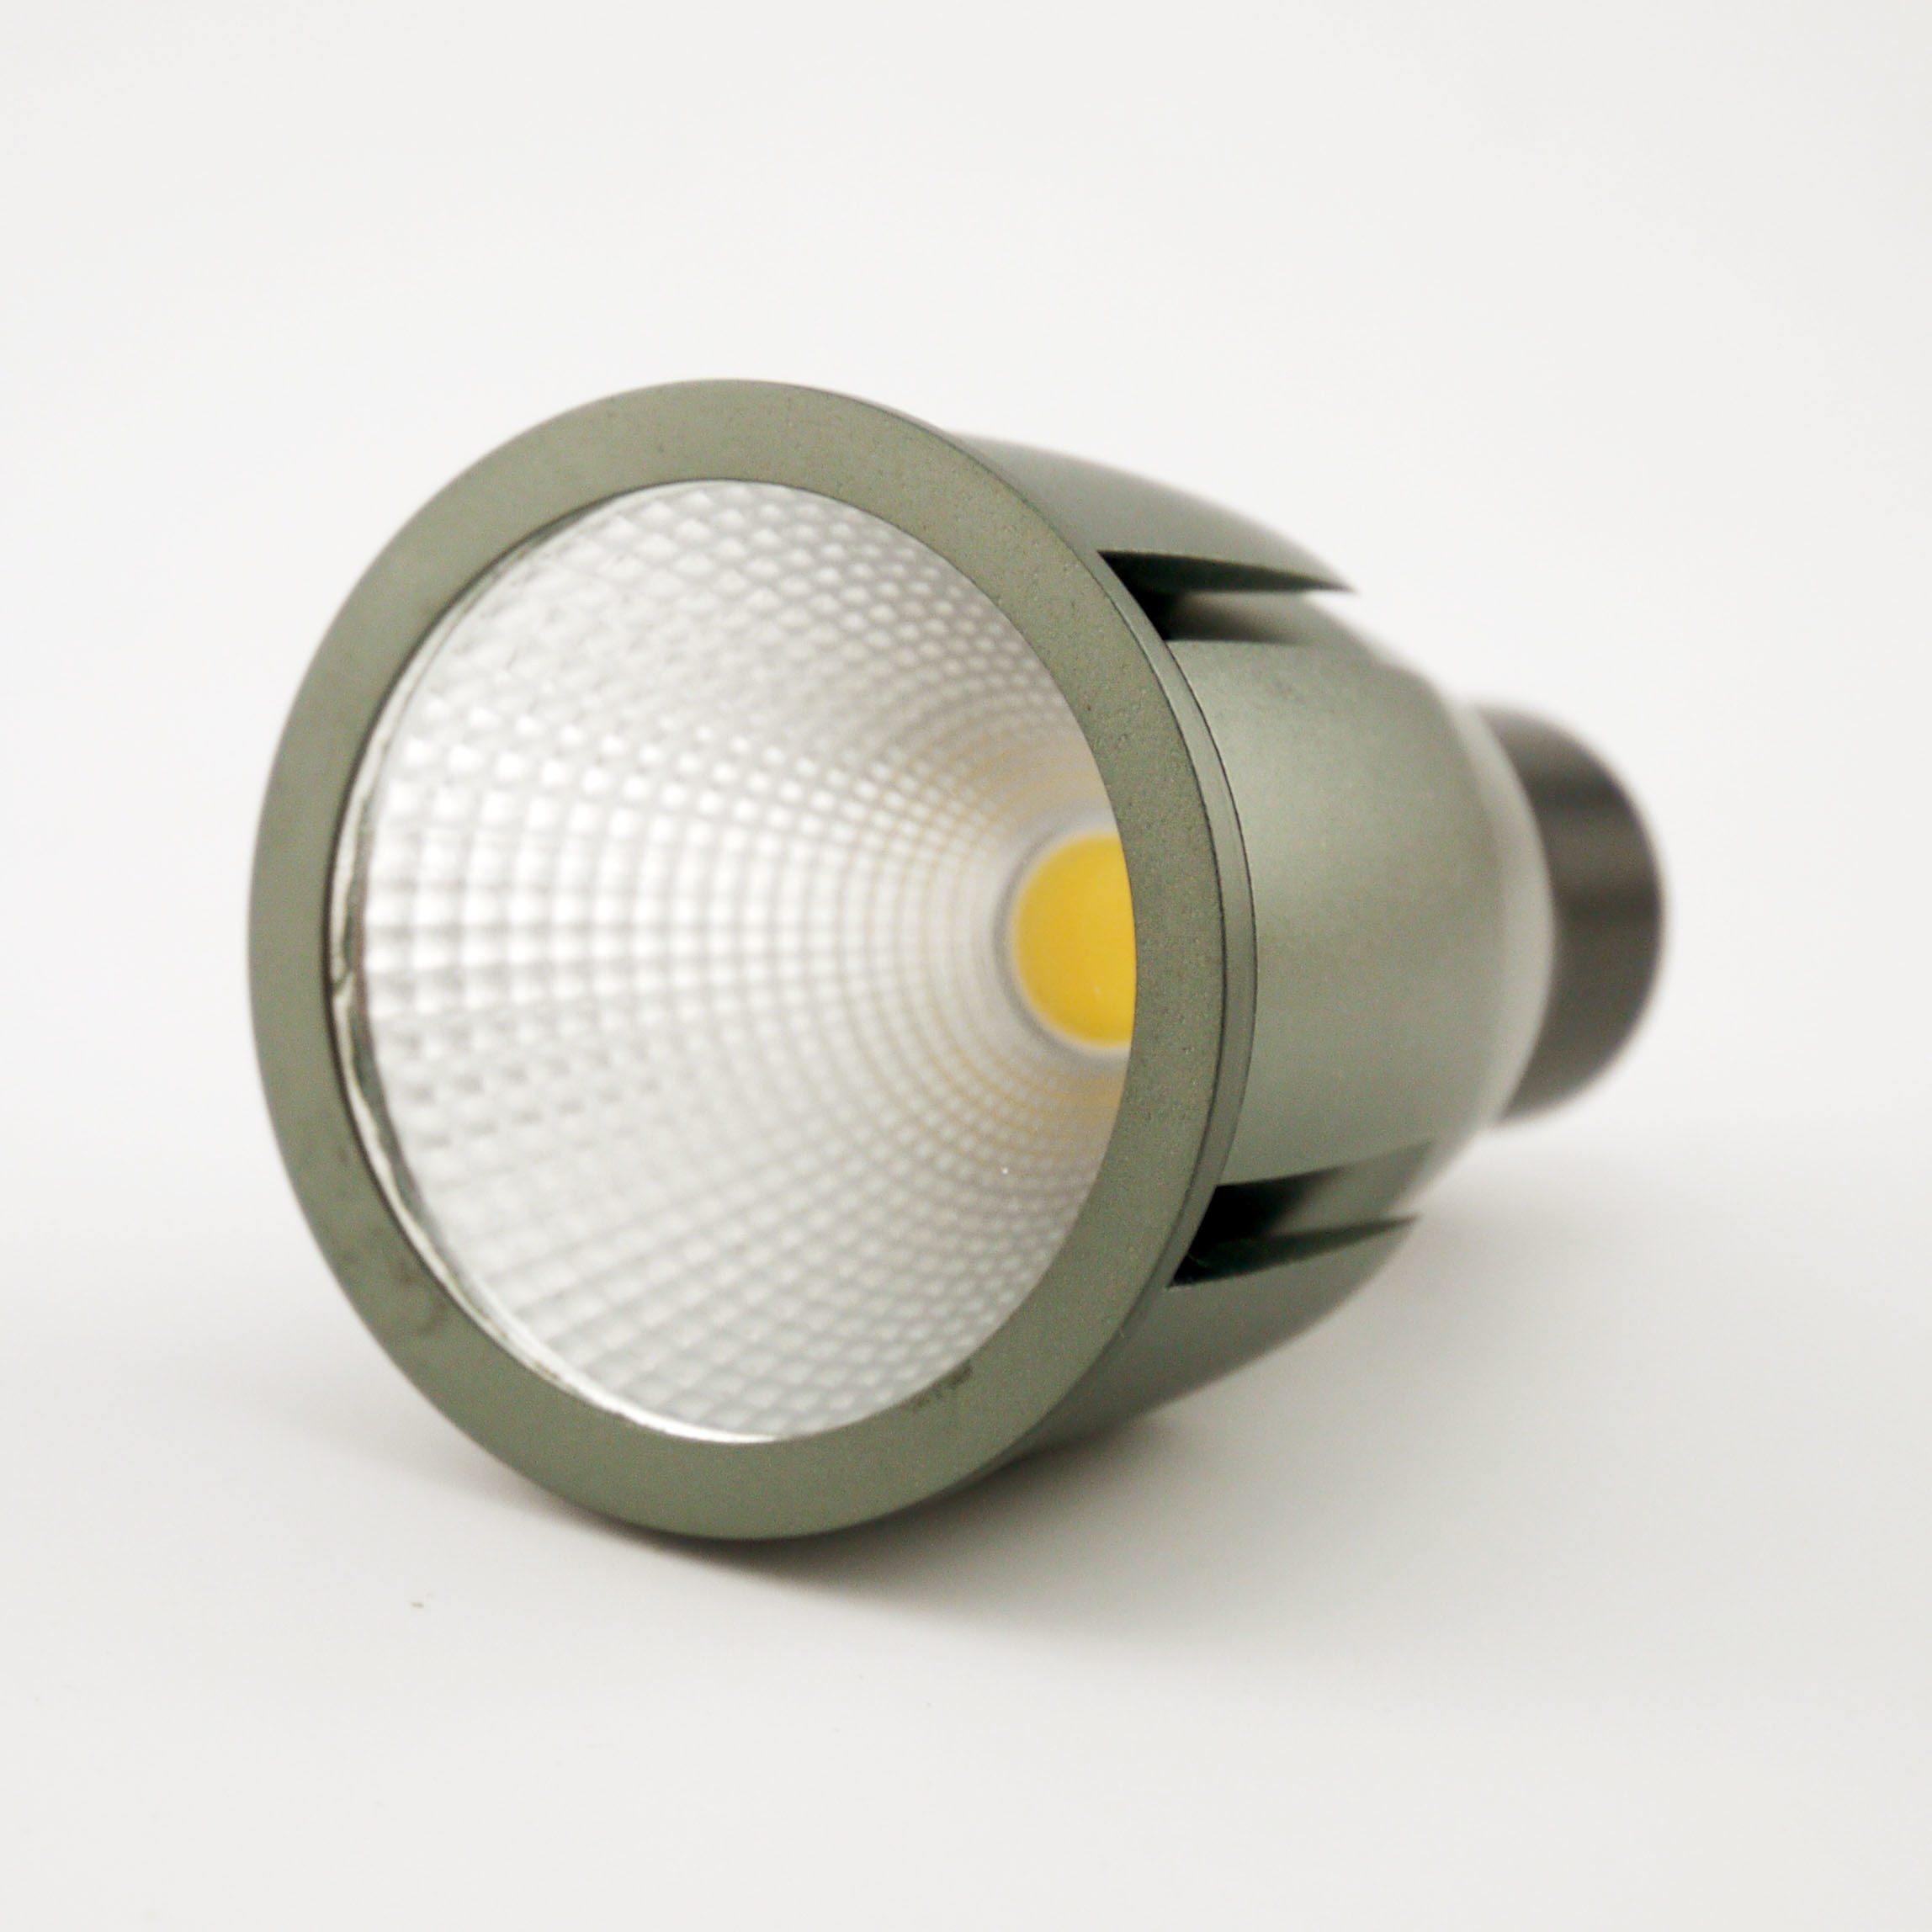 Aluminum 4W COB LED Recessed Downlight GU10 Bulb